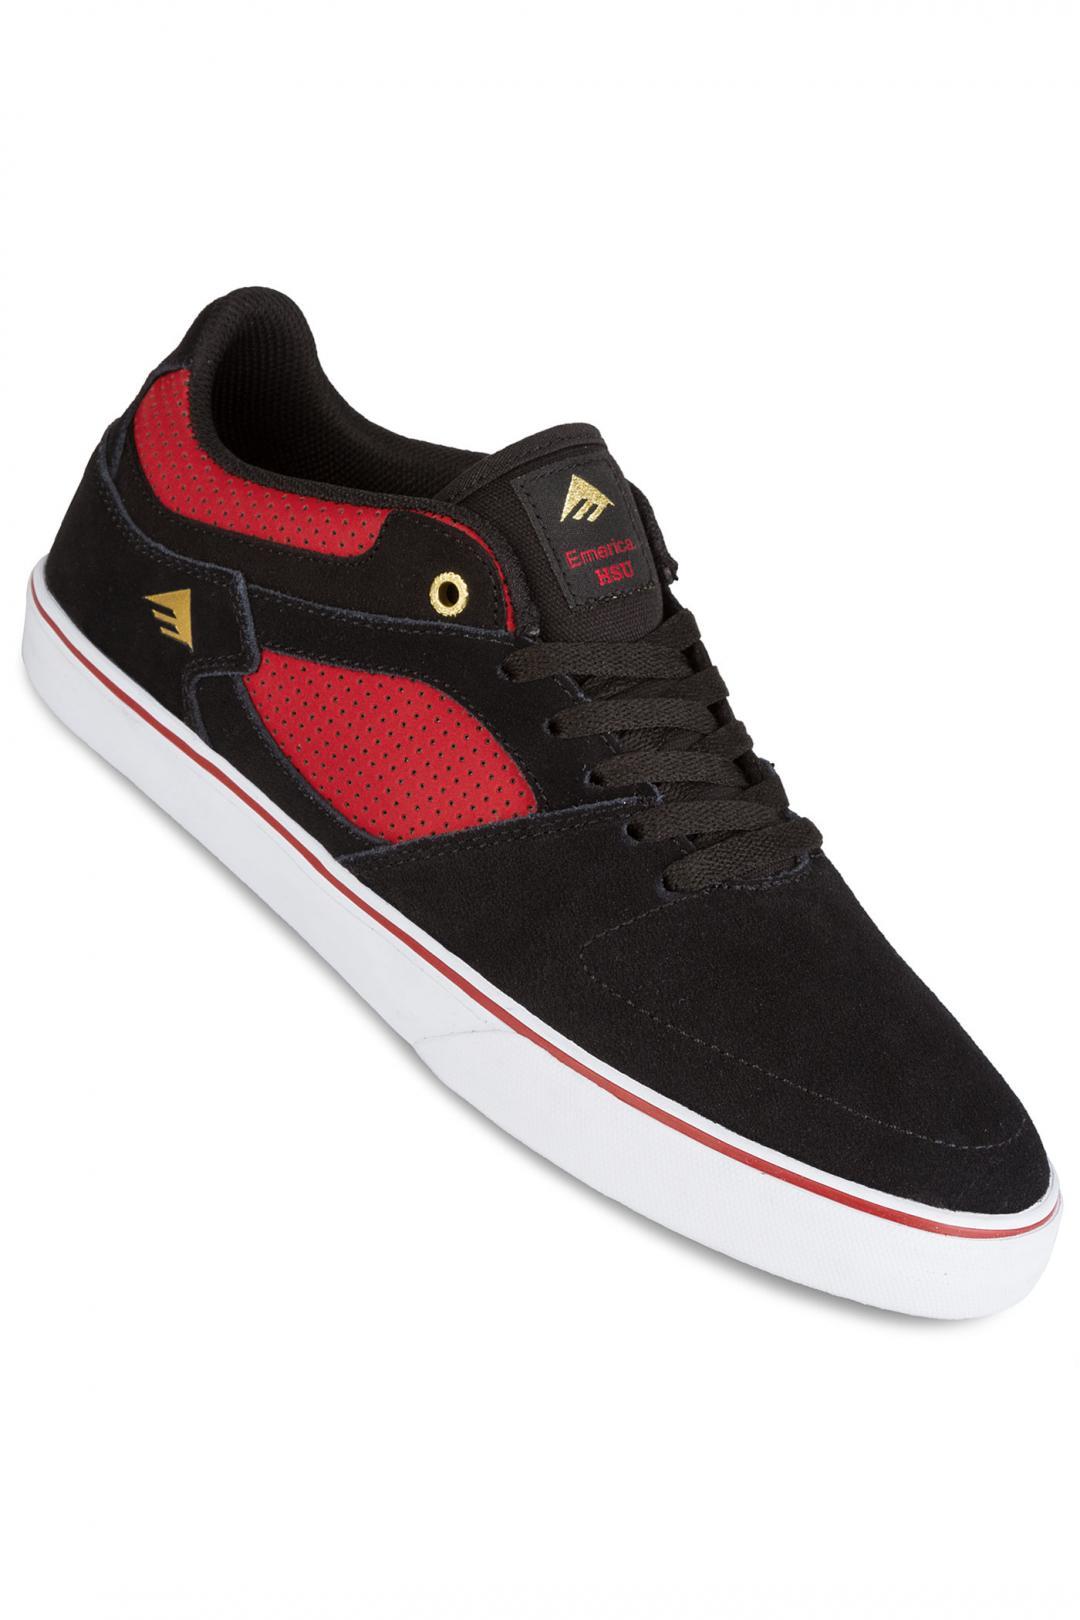 Uomo Emerica The HSU Low Vulc black red | Sneakers low top